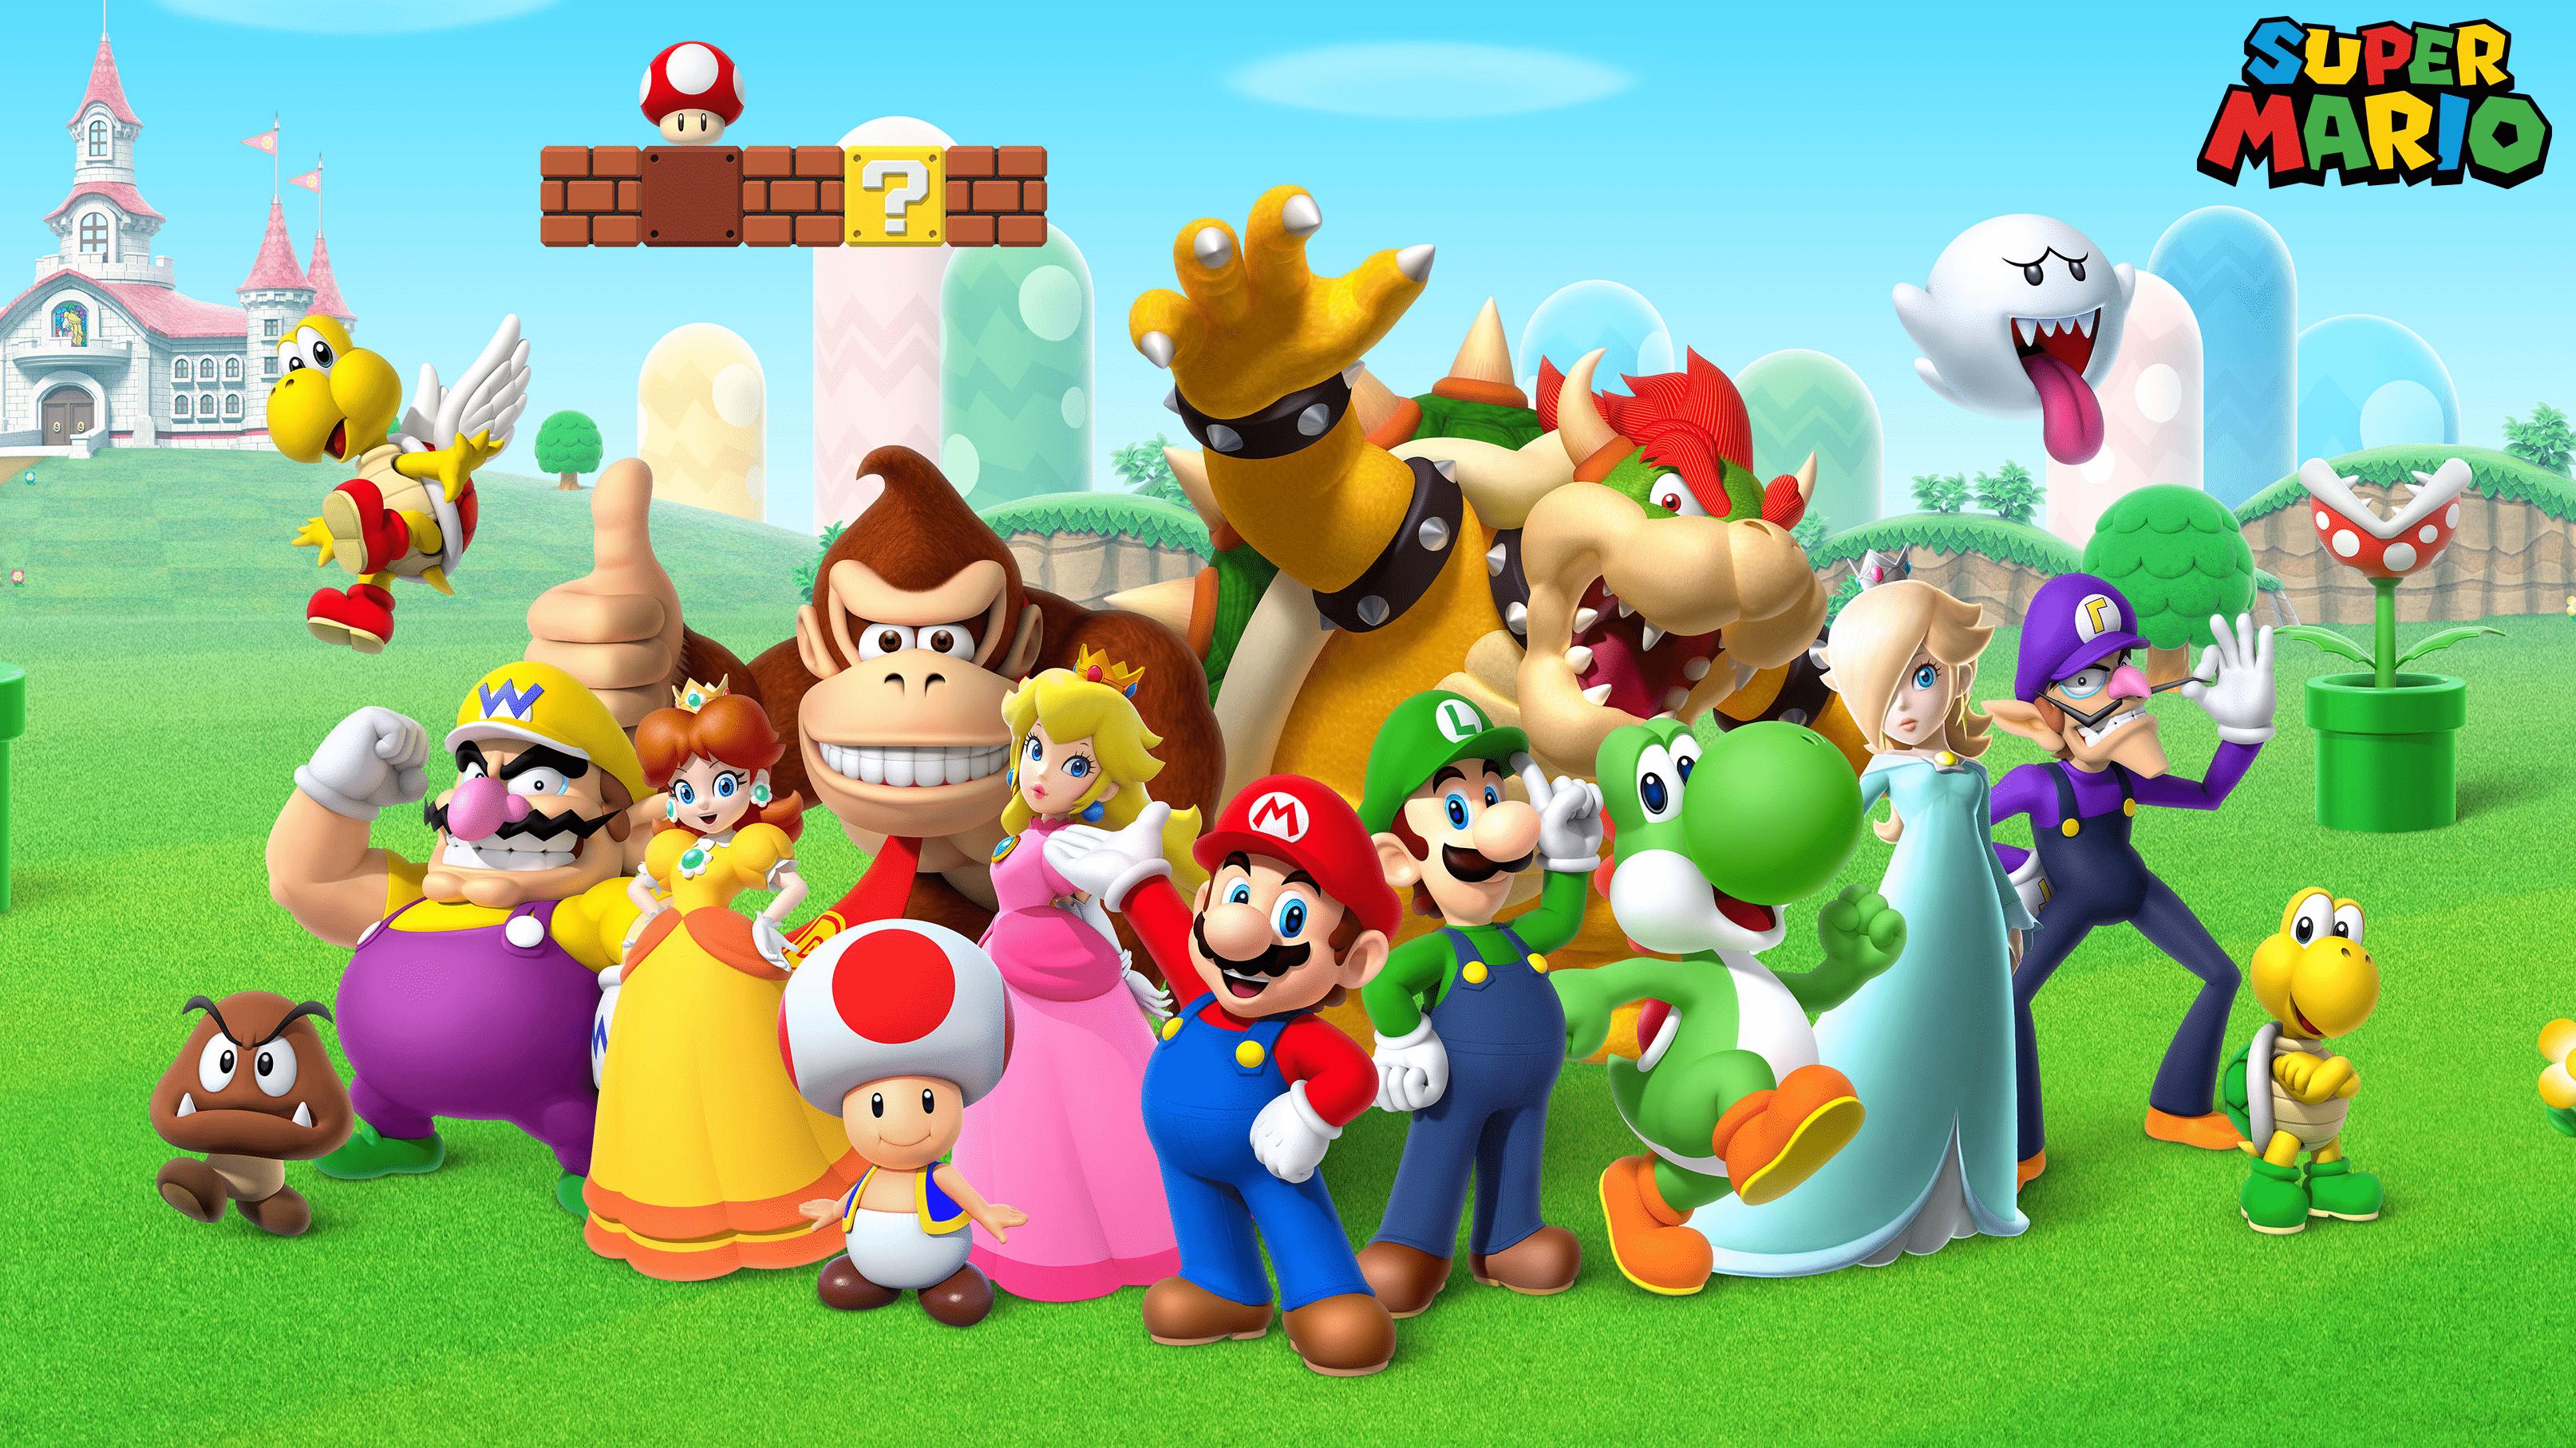 Super Mario Wallpapers Top Free Super Mario Backgrounds